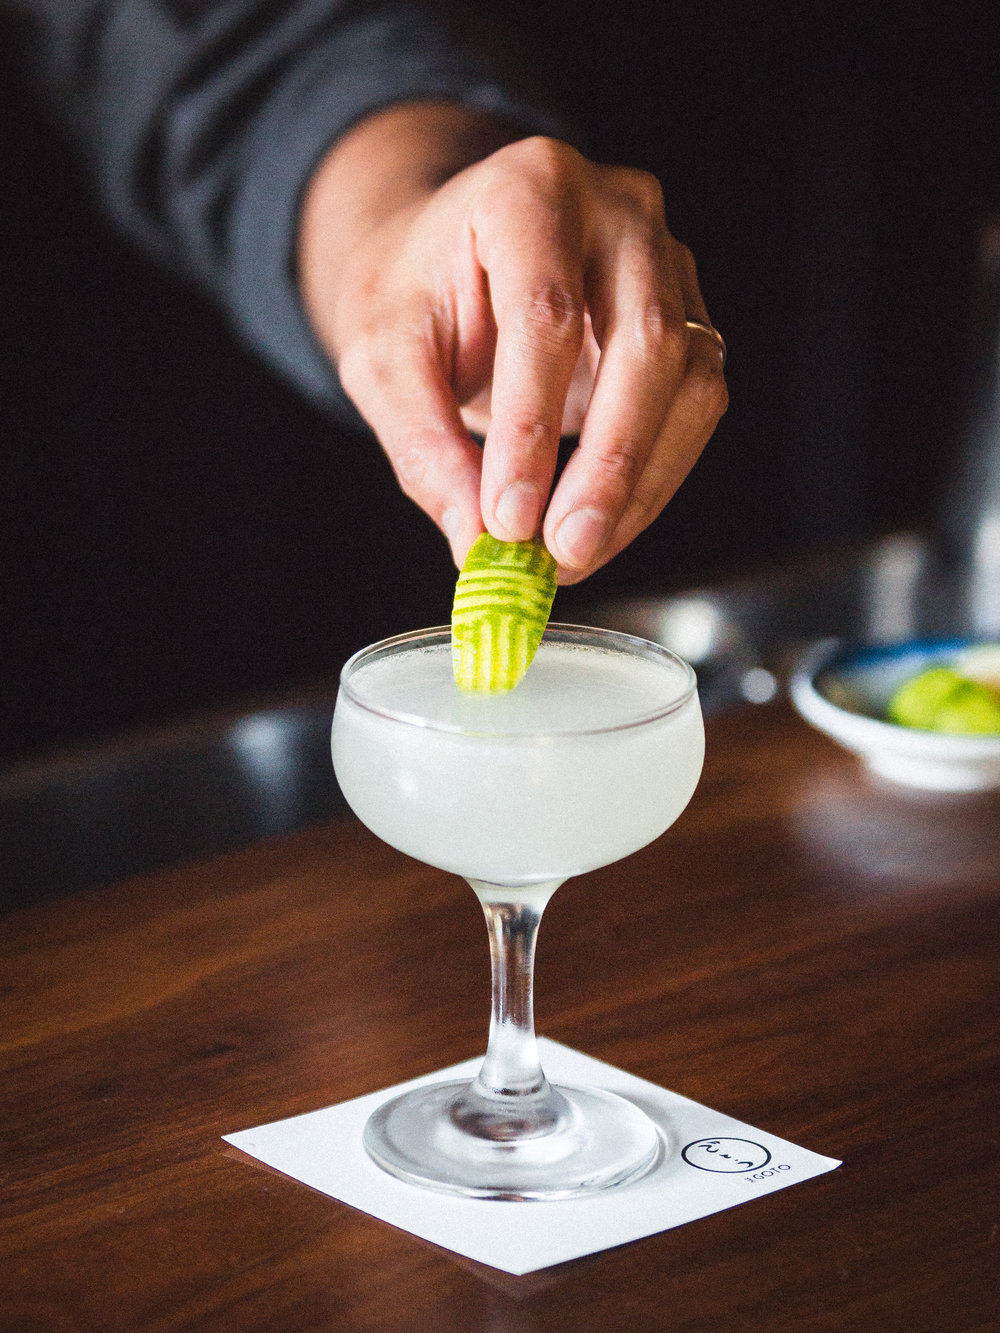 Kenta Goto Putting Limeon Cocktail Bar Lower East Side.jpg